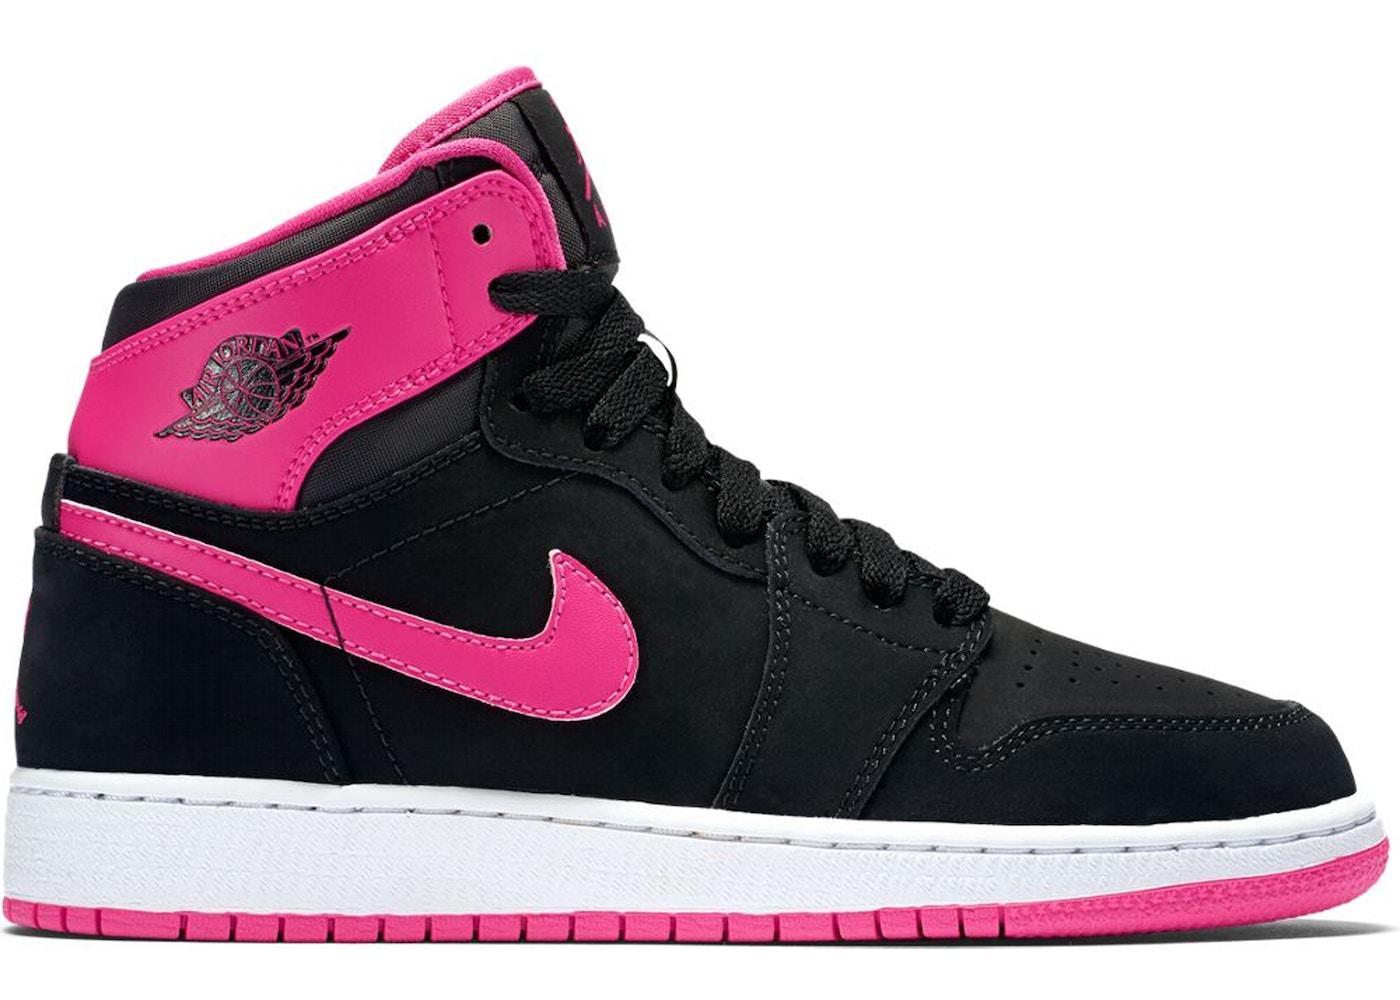 33e5c250bda3 Jordan 1 Retro High Black Vivid Pink (GS) - 332148-008